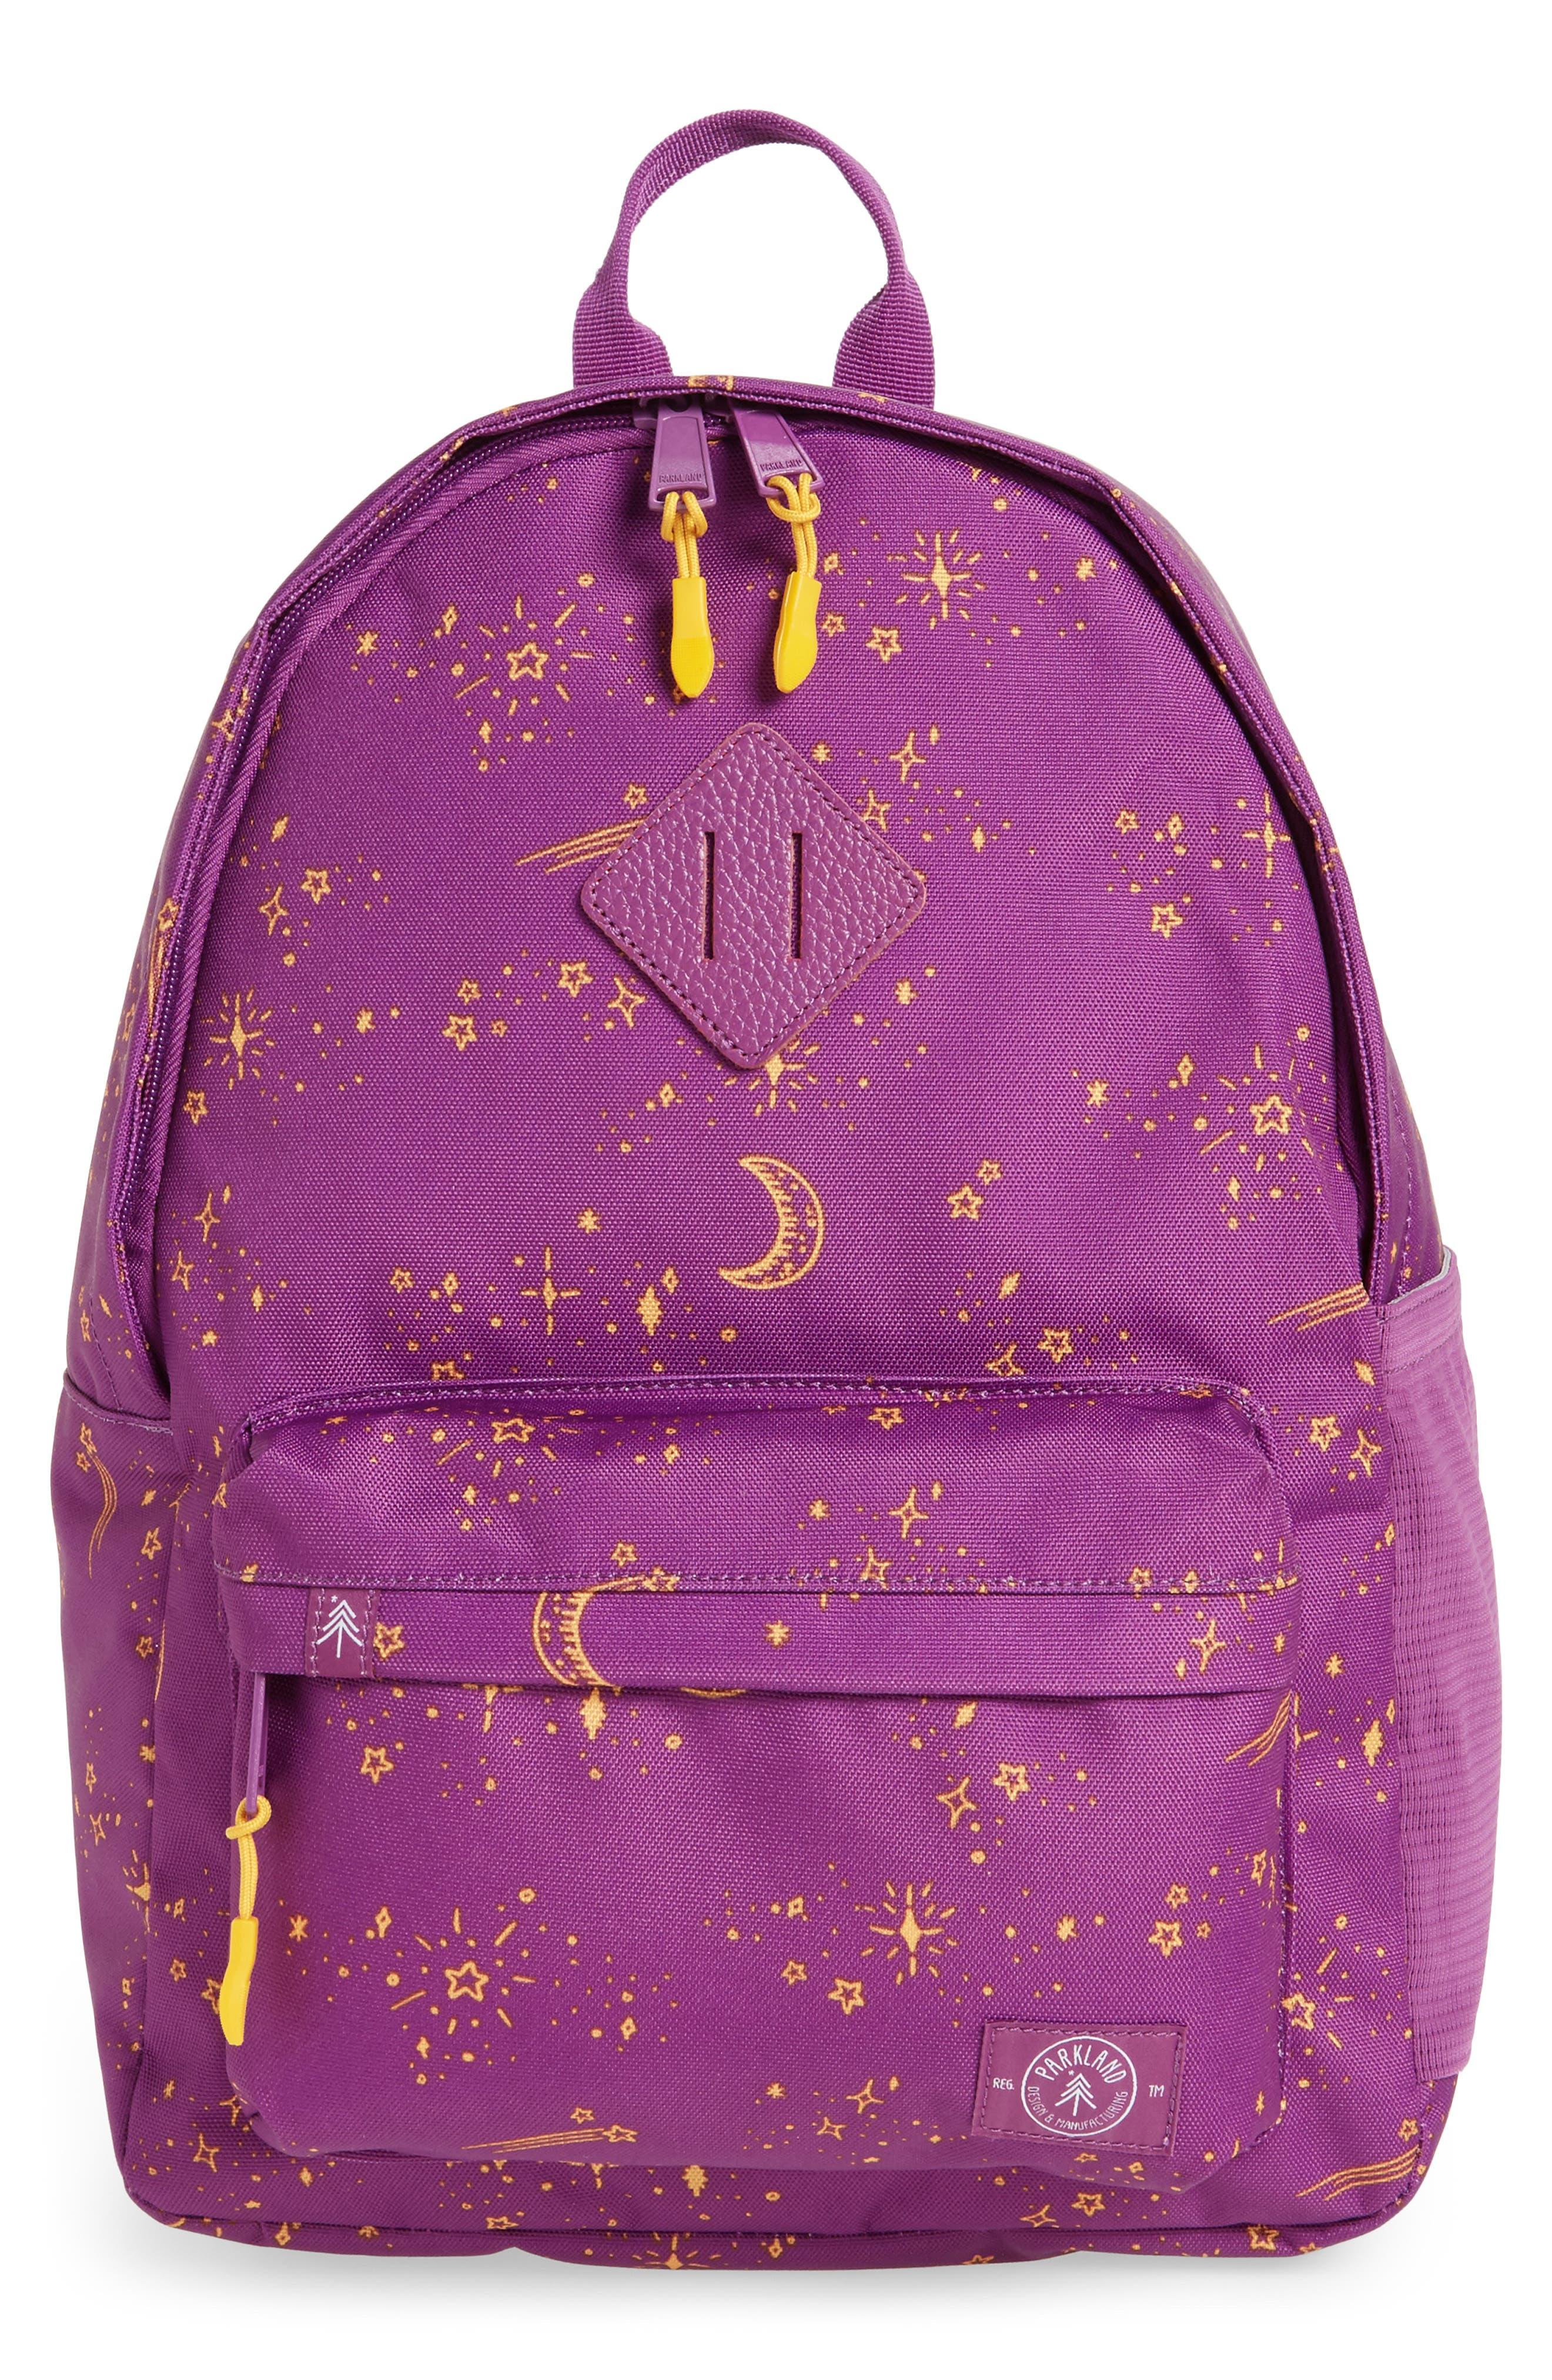 Main Image - Parkland Bayside - Sweet Dreams Backpack (Kids)